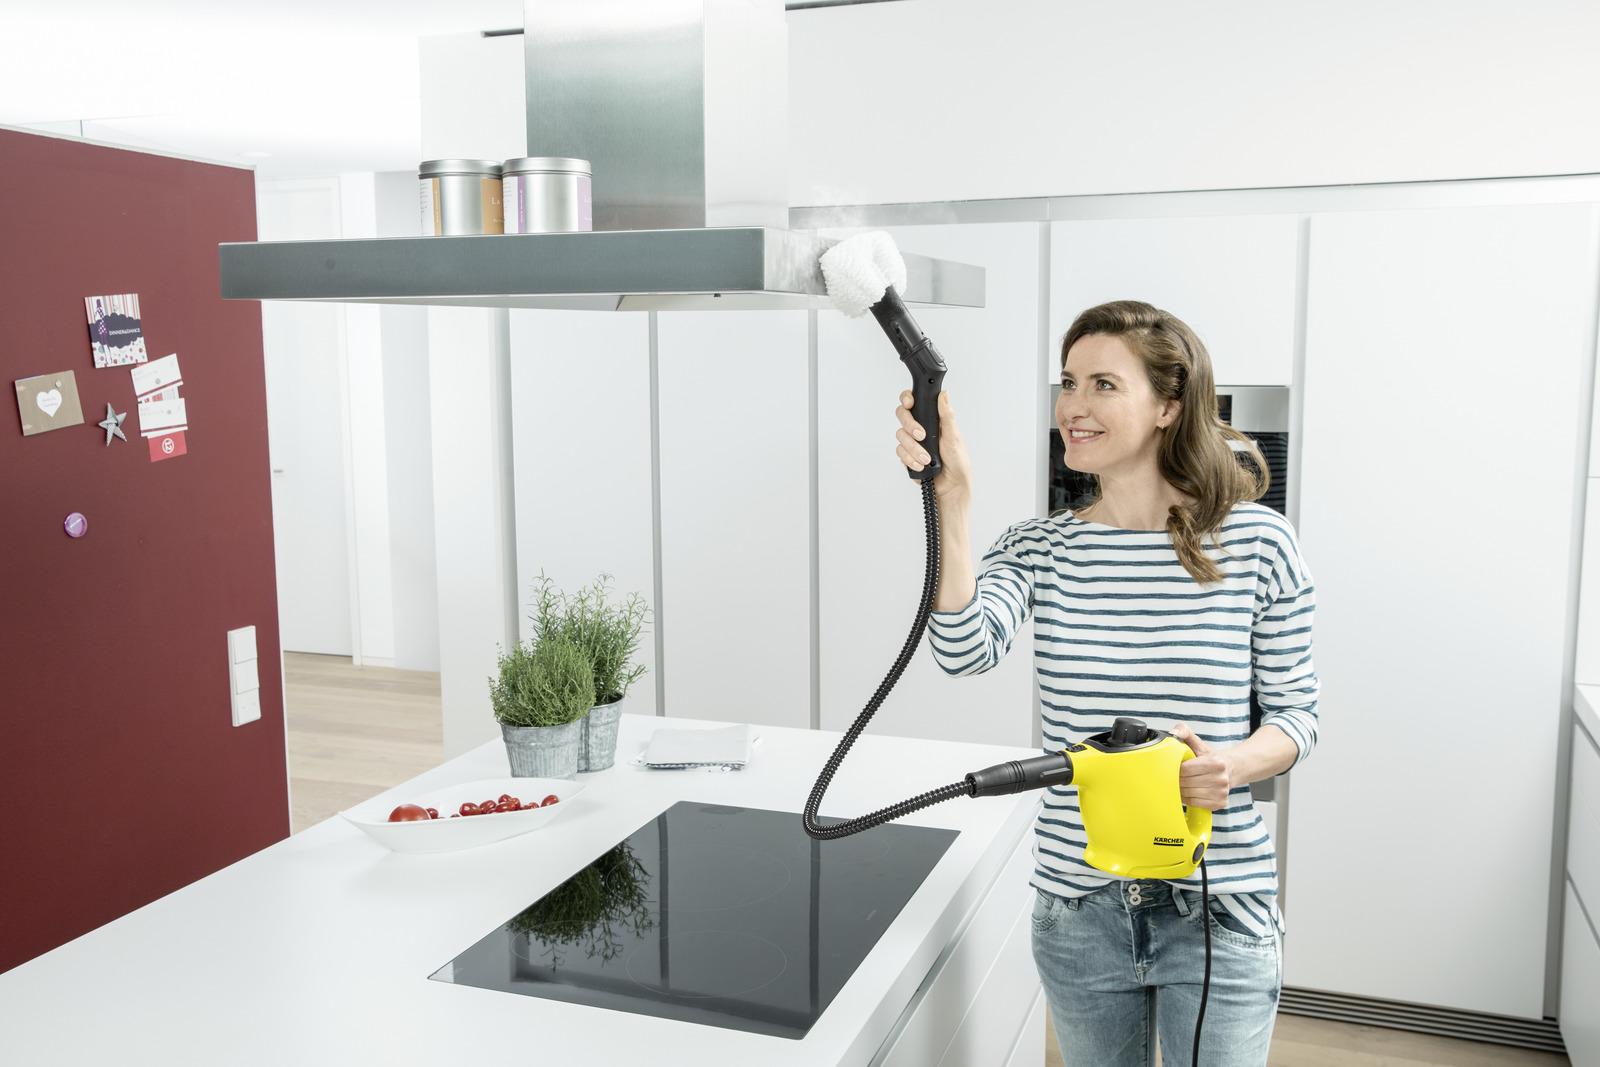 steam cleaner sc 1 easyfix premium karcher nz. Black Bedroom Furniture Sets. Home Design Ideas